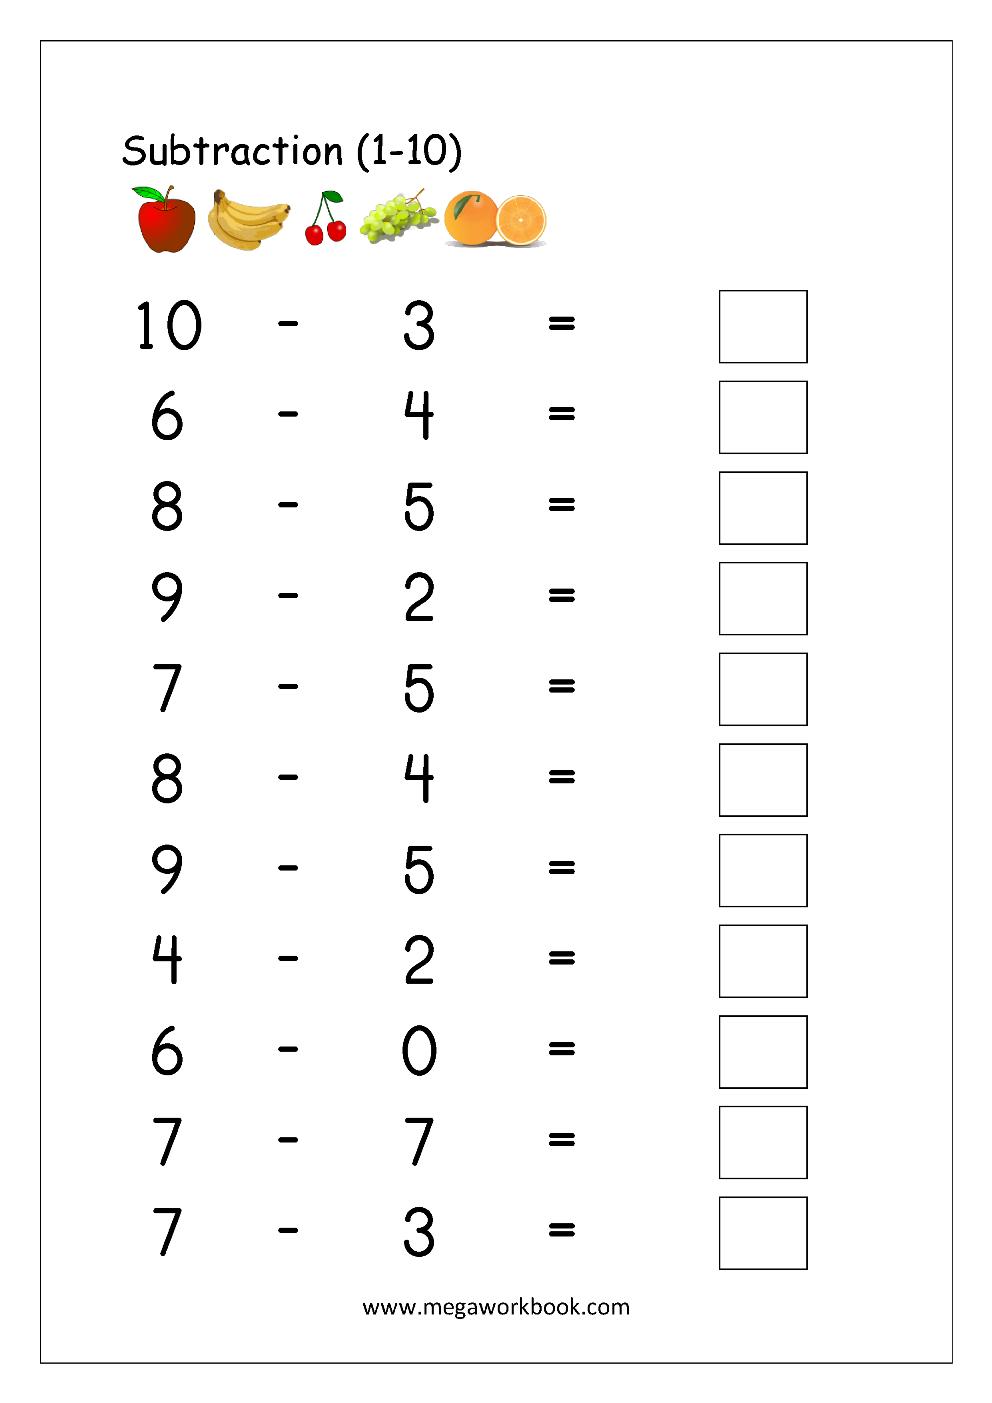 Math Worksheet - Subtraction (1-10)   Math subtraction worksheets [ 1403 x 992 Pixel ]